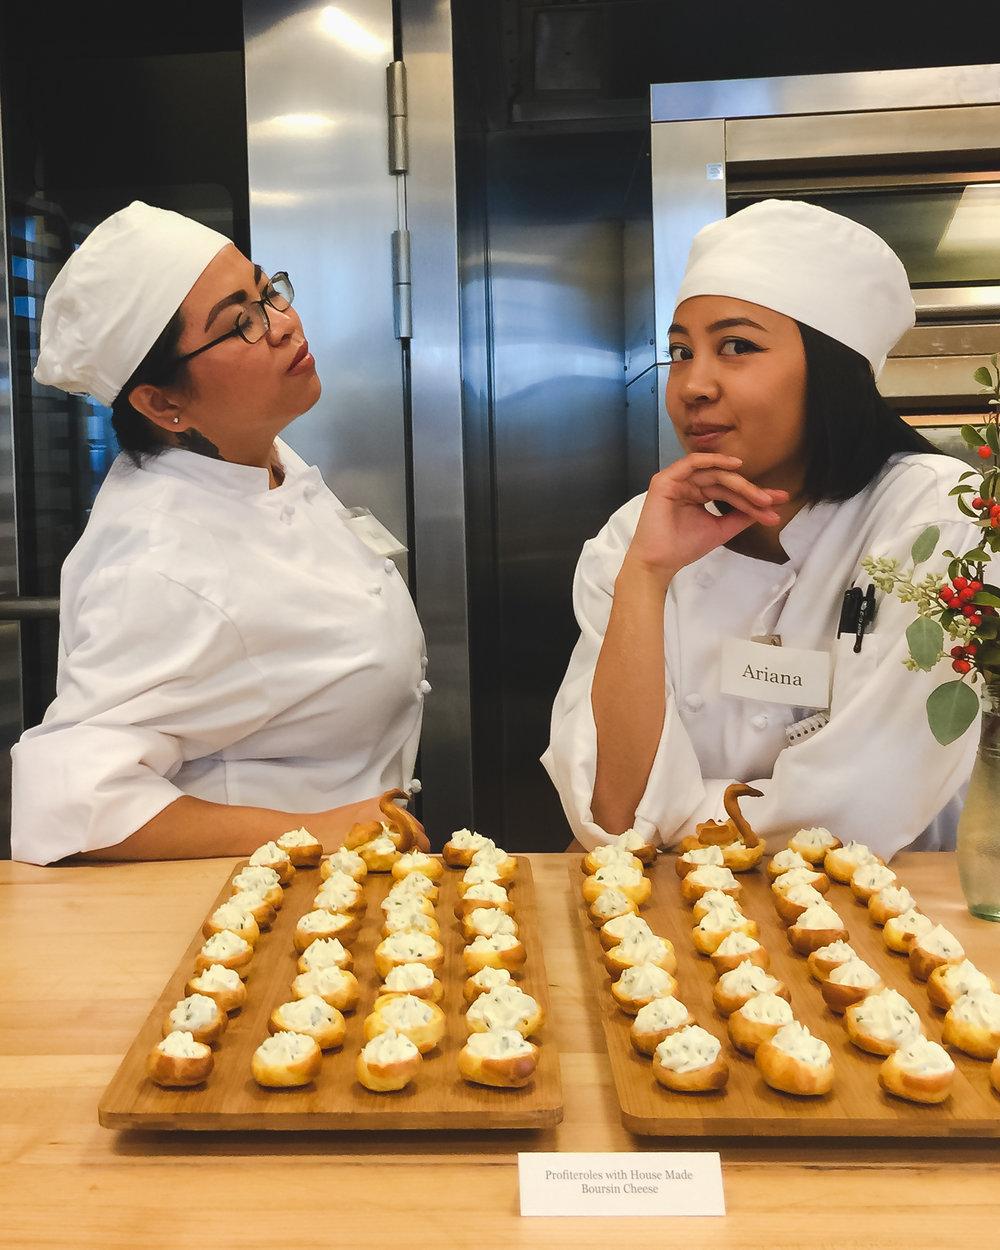 Hi, I'm Ariana (right). CCSF Culinary Program Grad, Institute of Culinary Education Grad in Culinary Arts, Food Photographer, and Food Pin Maker.